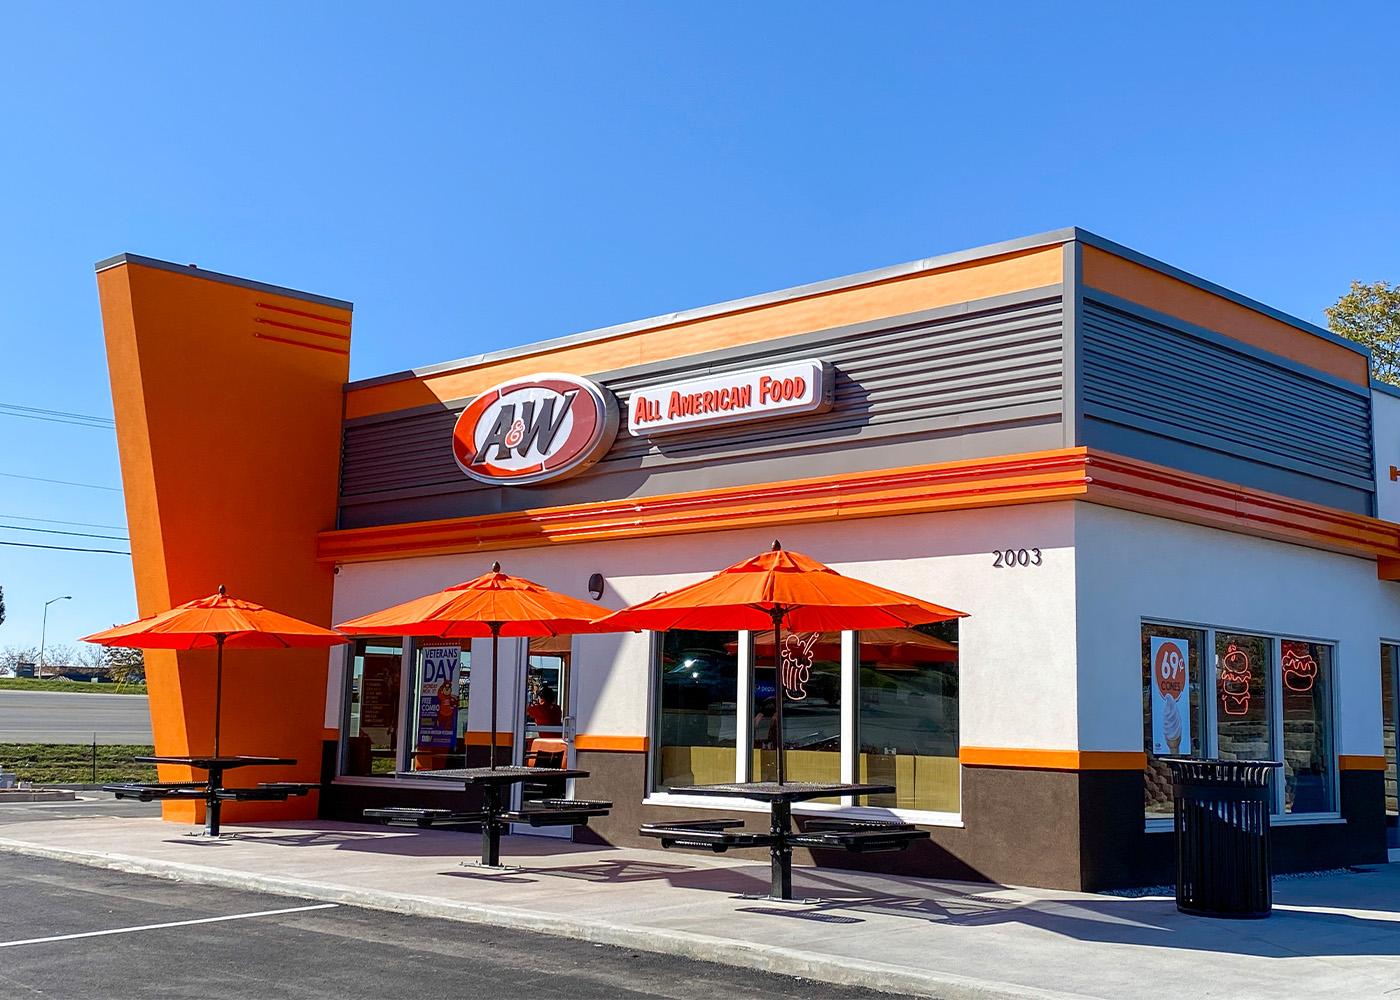 Exterior photo of A&W Restaurant in Richmond, Kentucky.